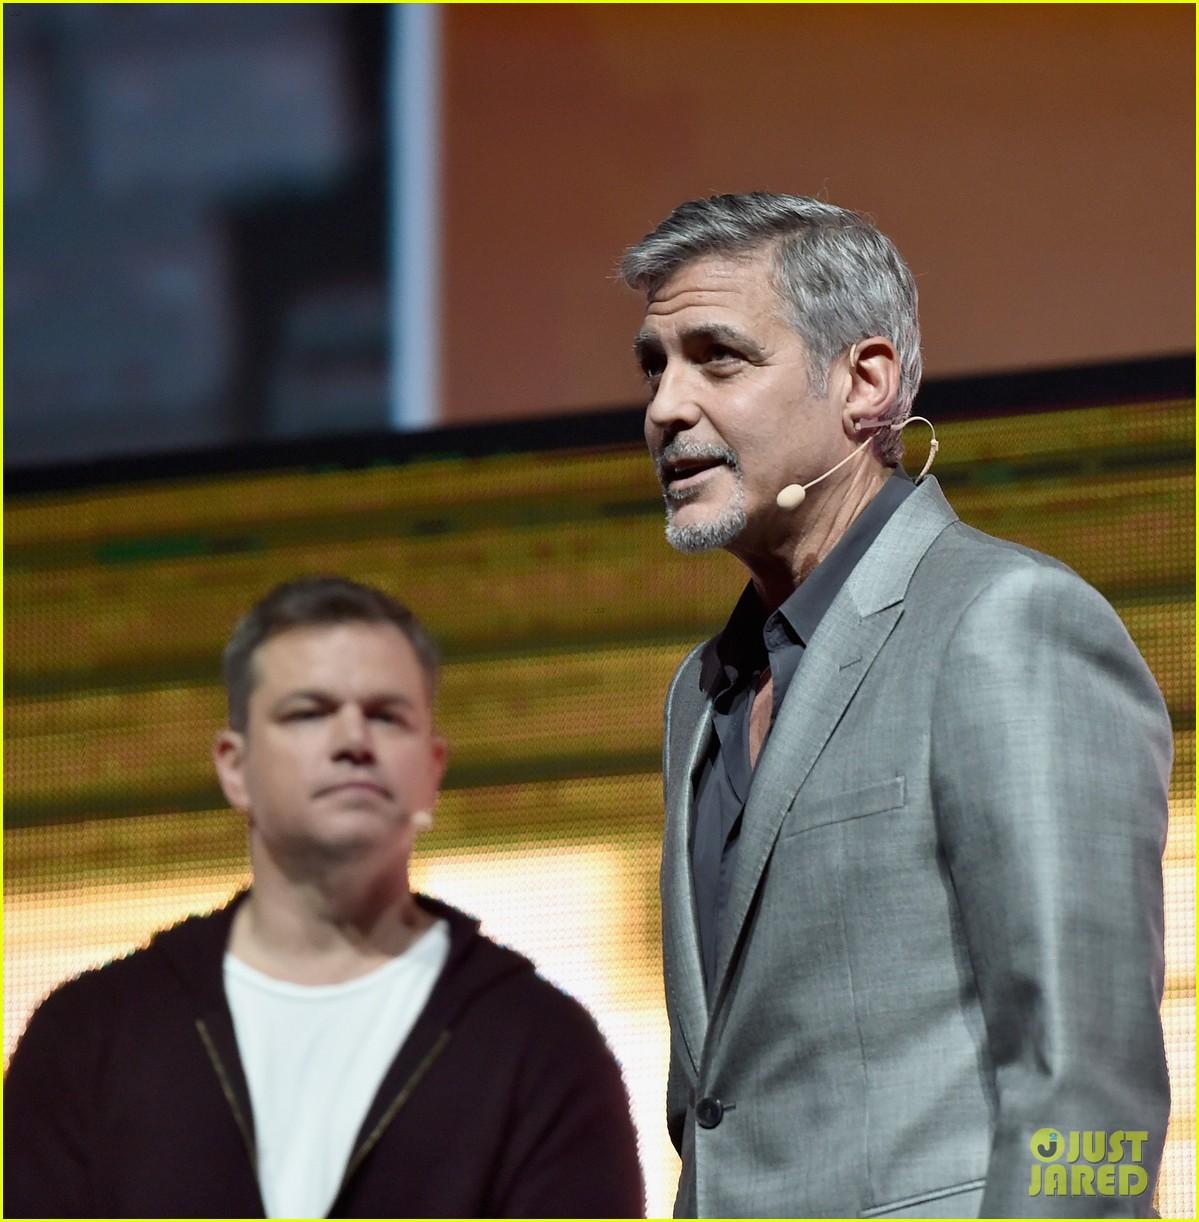 George Clooney at CinemaCon presenting Suburbicon George-clooney-julianne-moore-matt-damon-cinemacon-2017-02